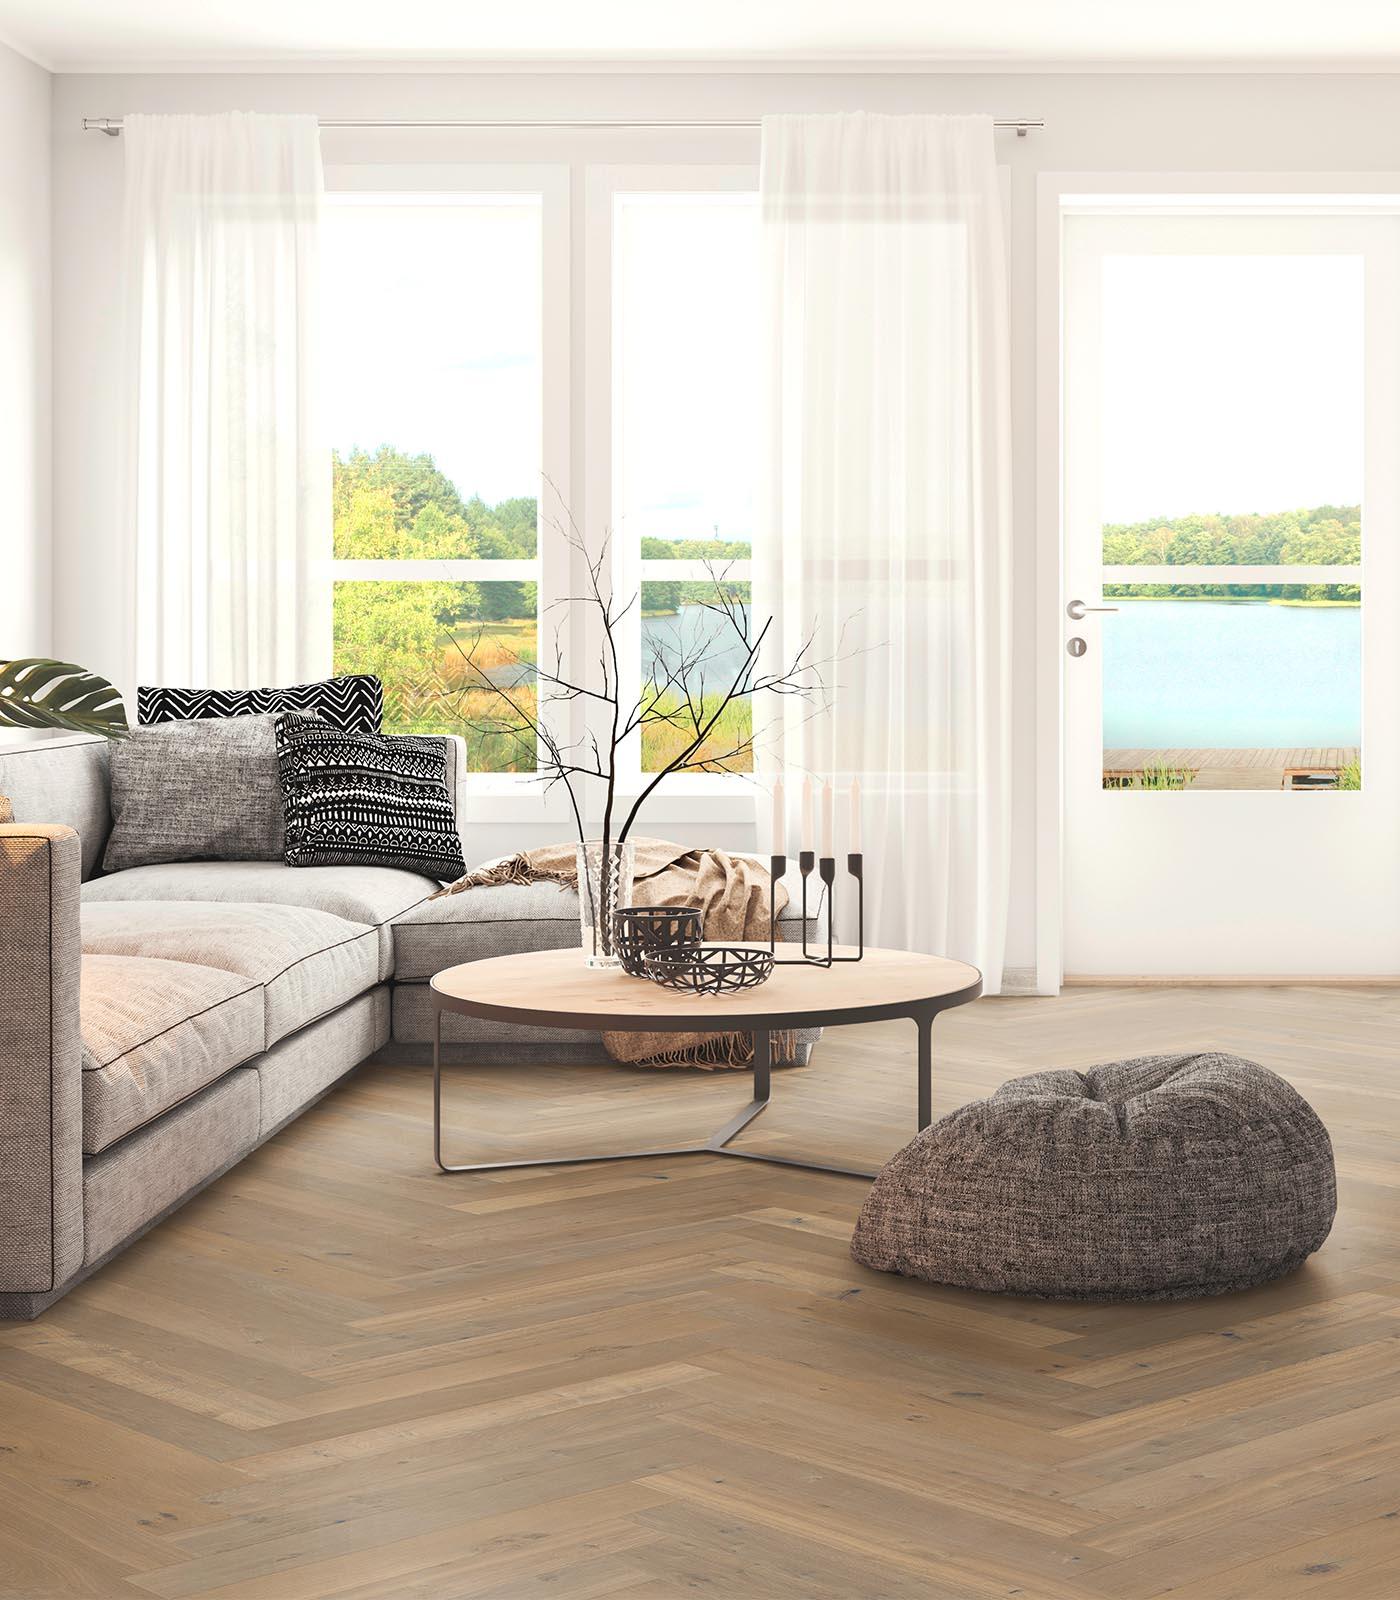 Fashion Collection-Herringbone-St Moritz-Western European oak flooring-room